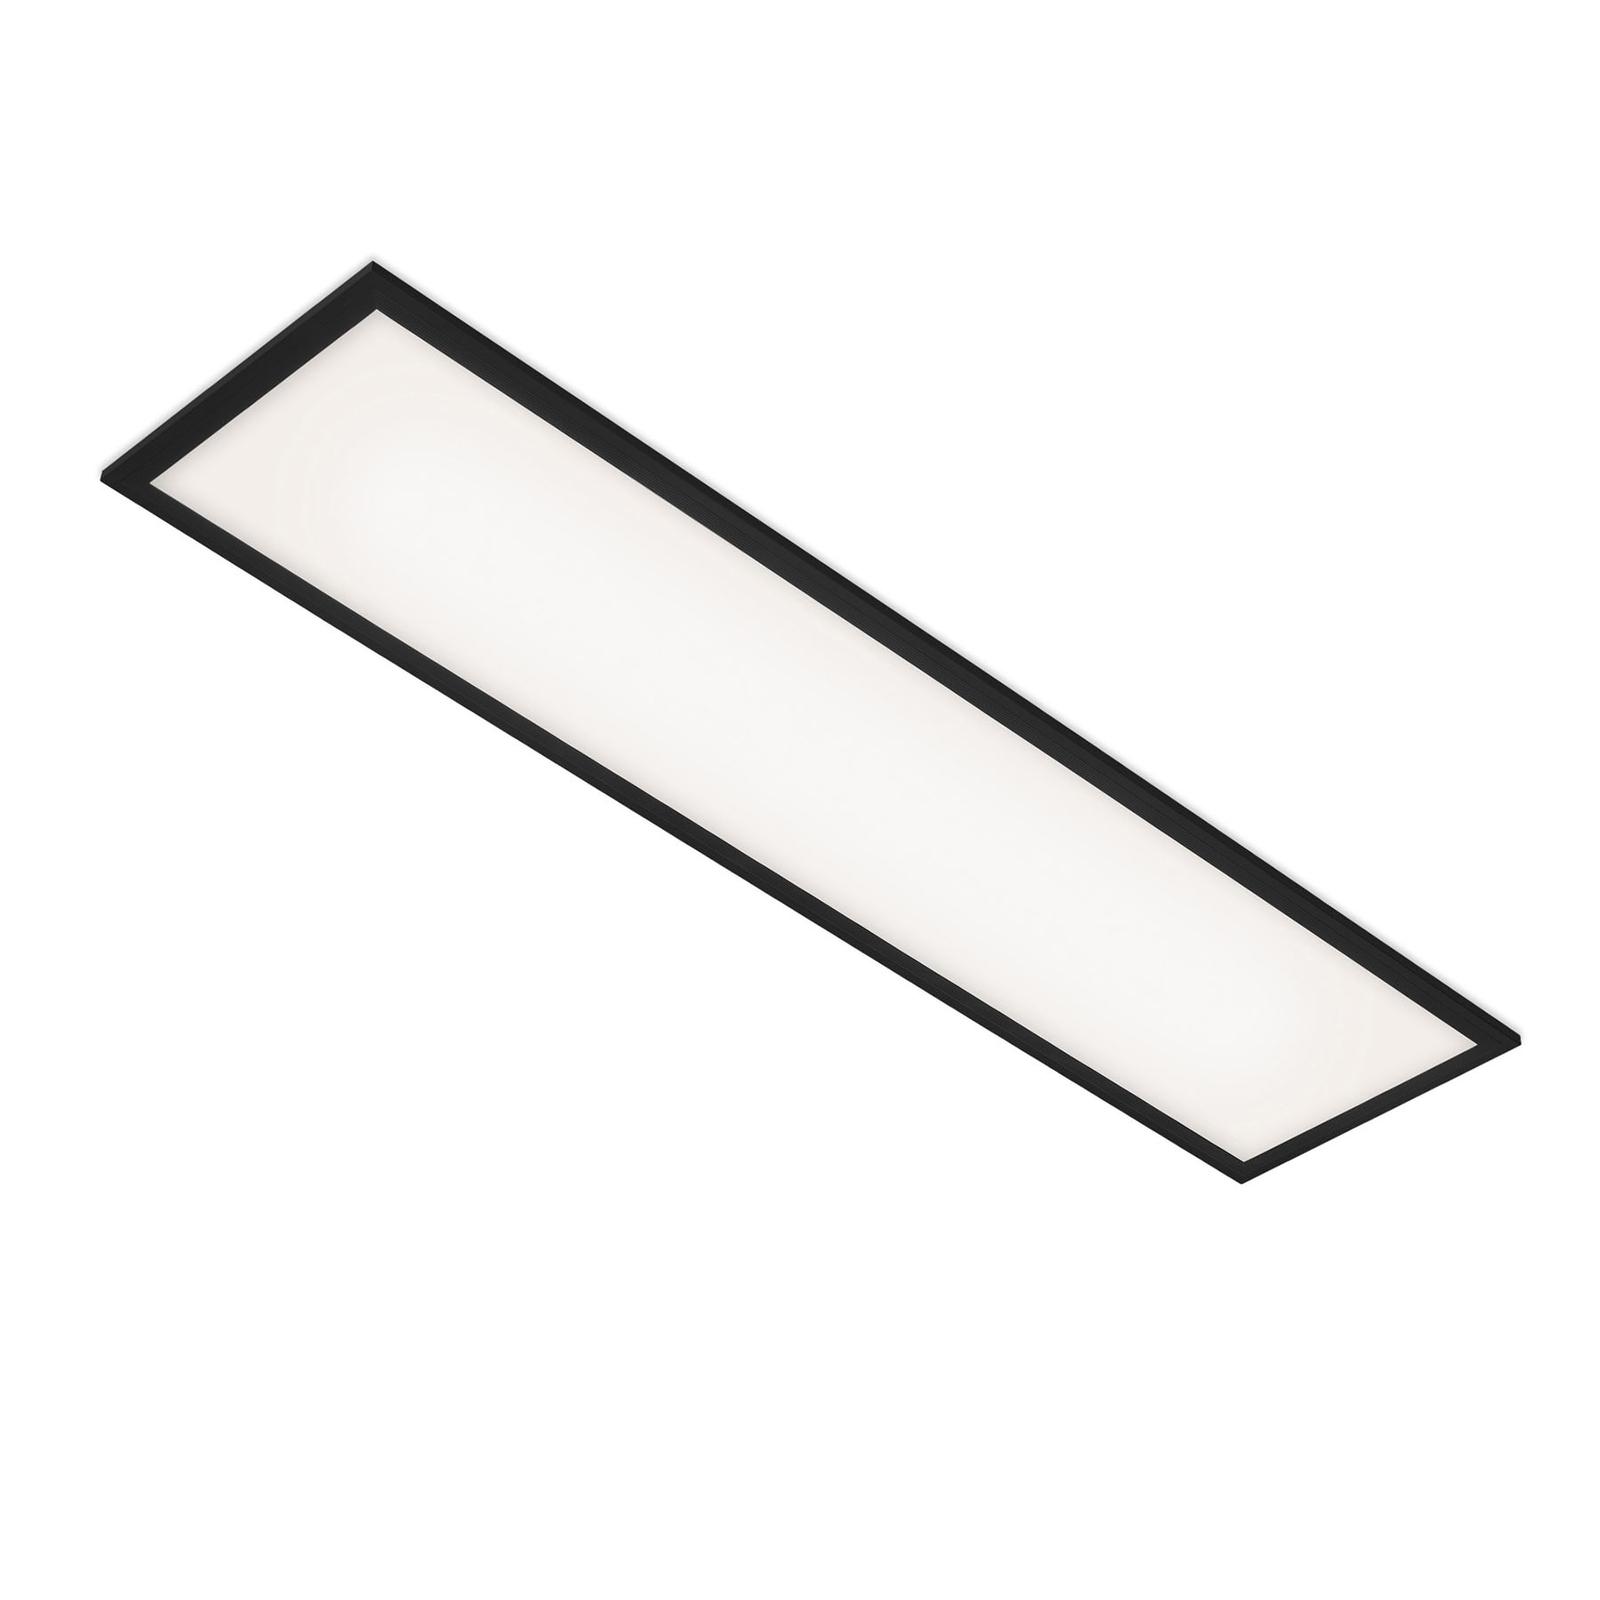 LED-panel Piatto CCT med fjernkontroll, firkantet